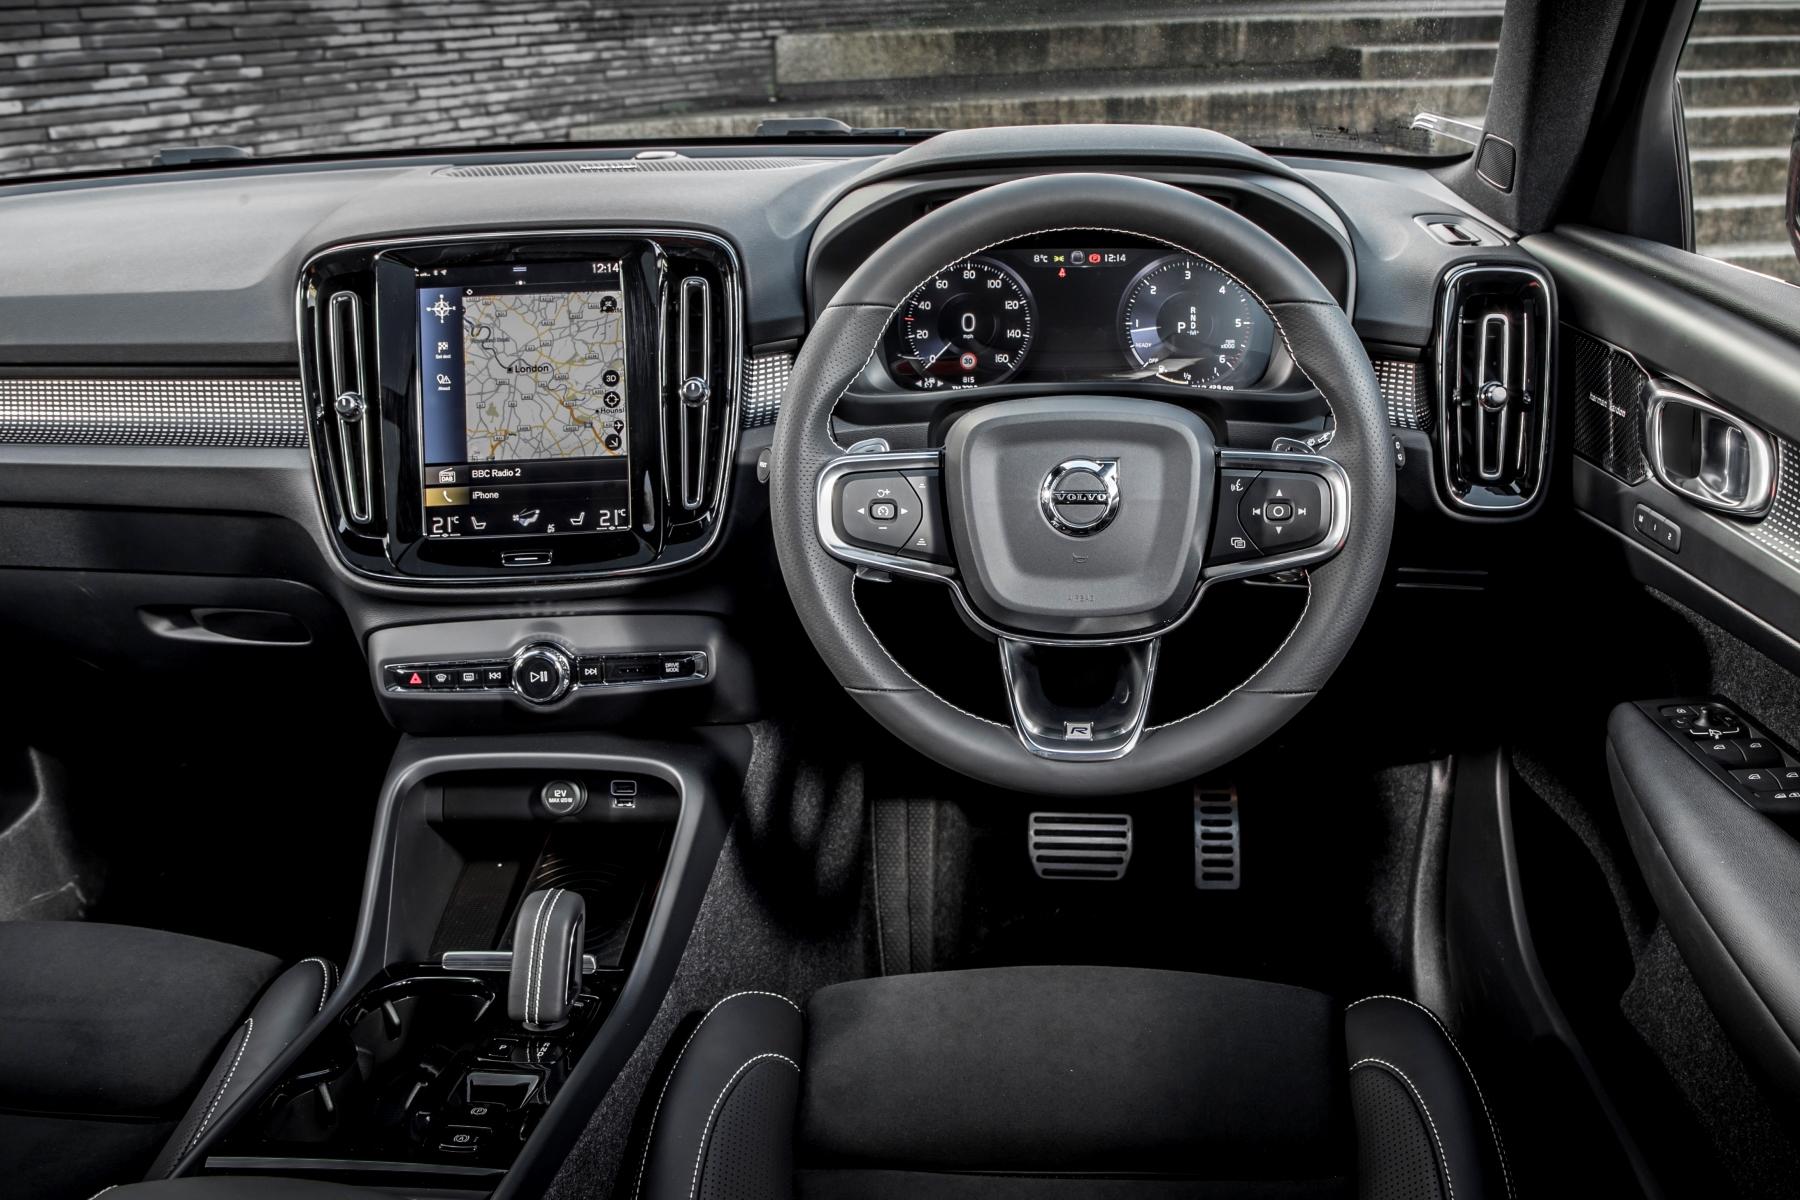 Volvo xc40 review automotive blog for Interior design review